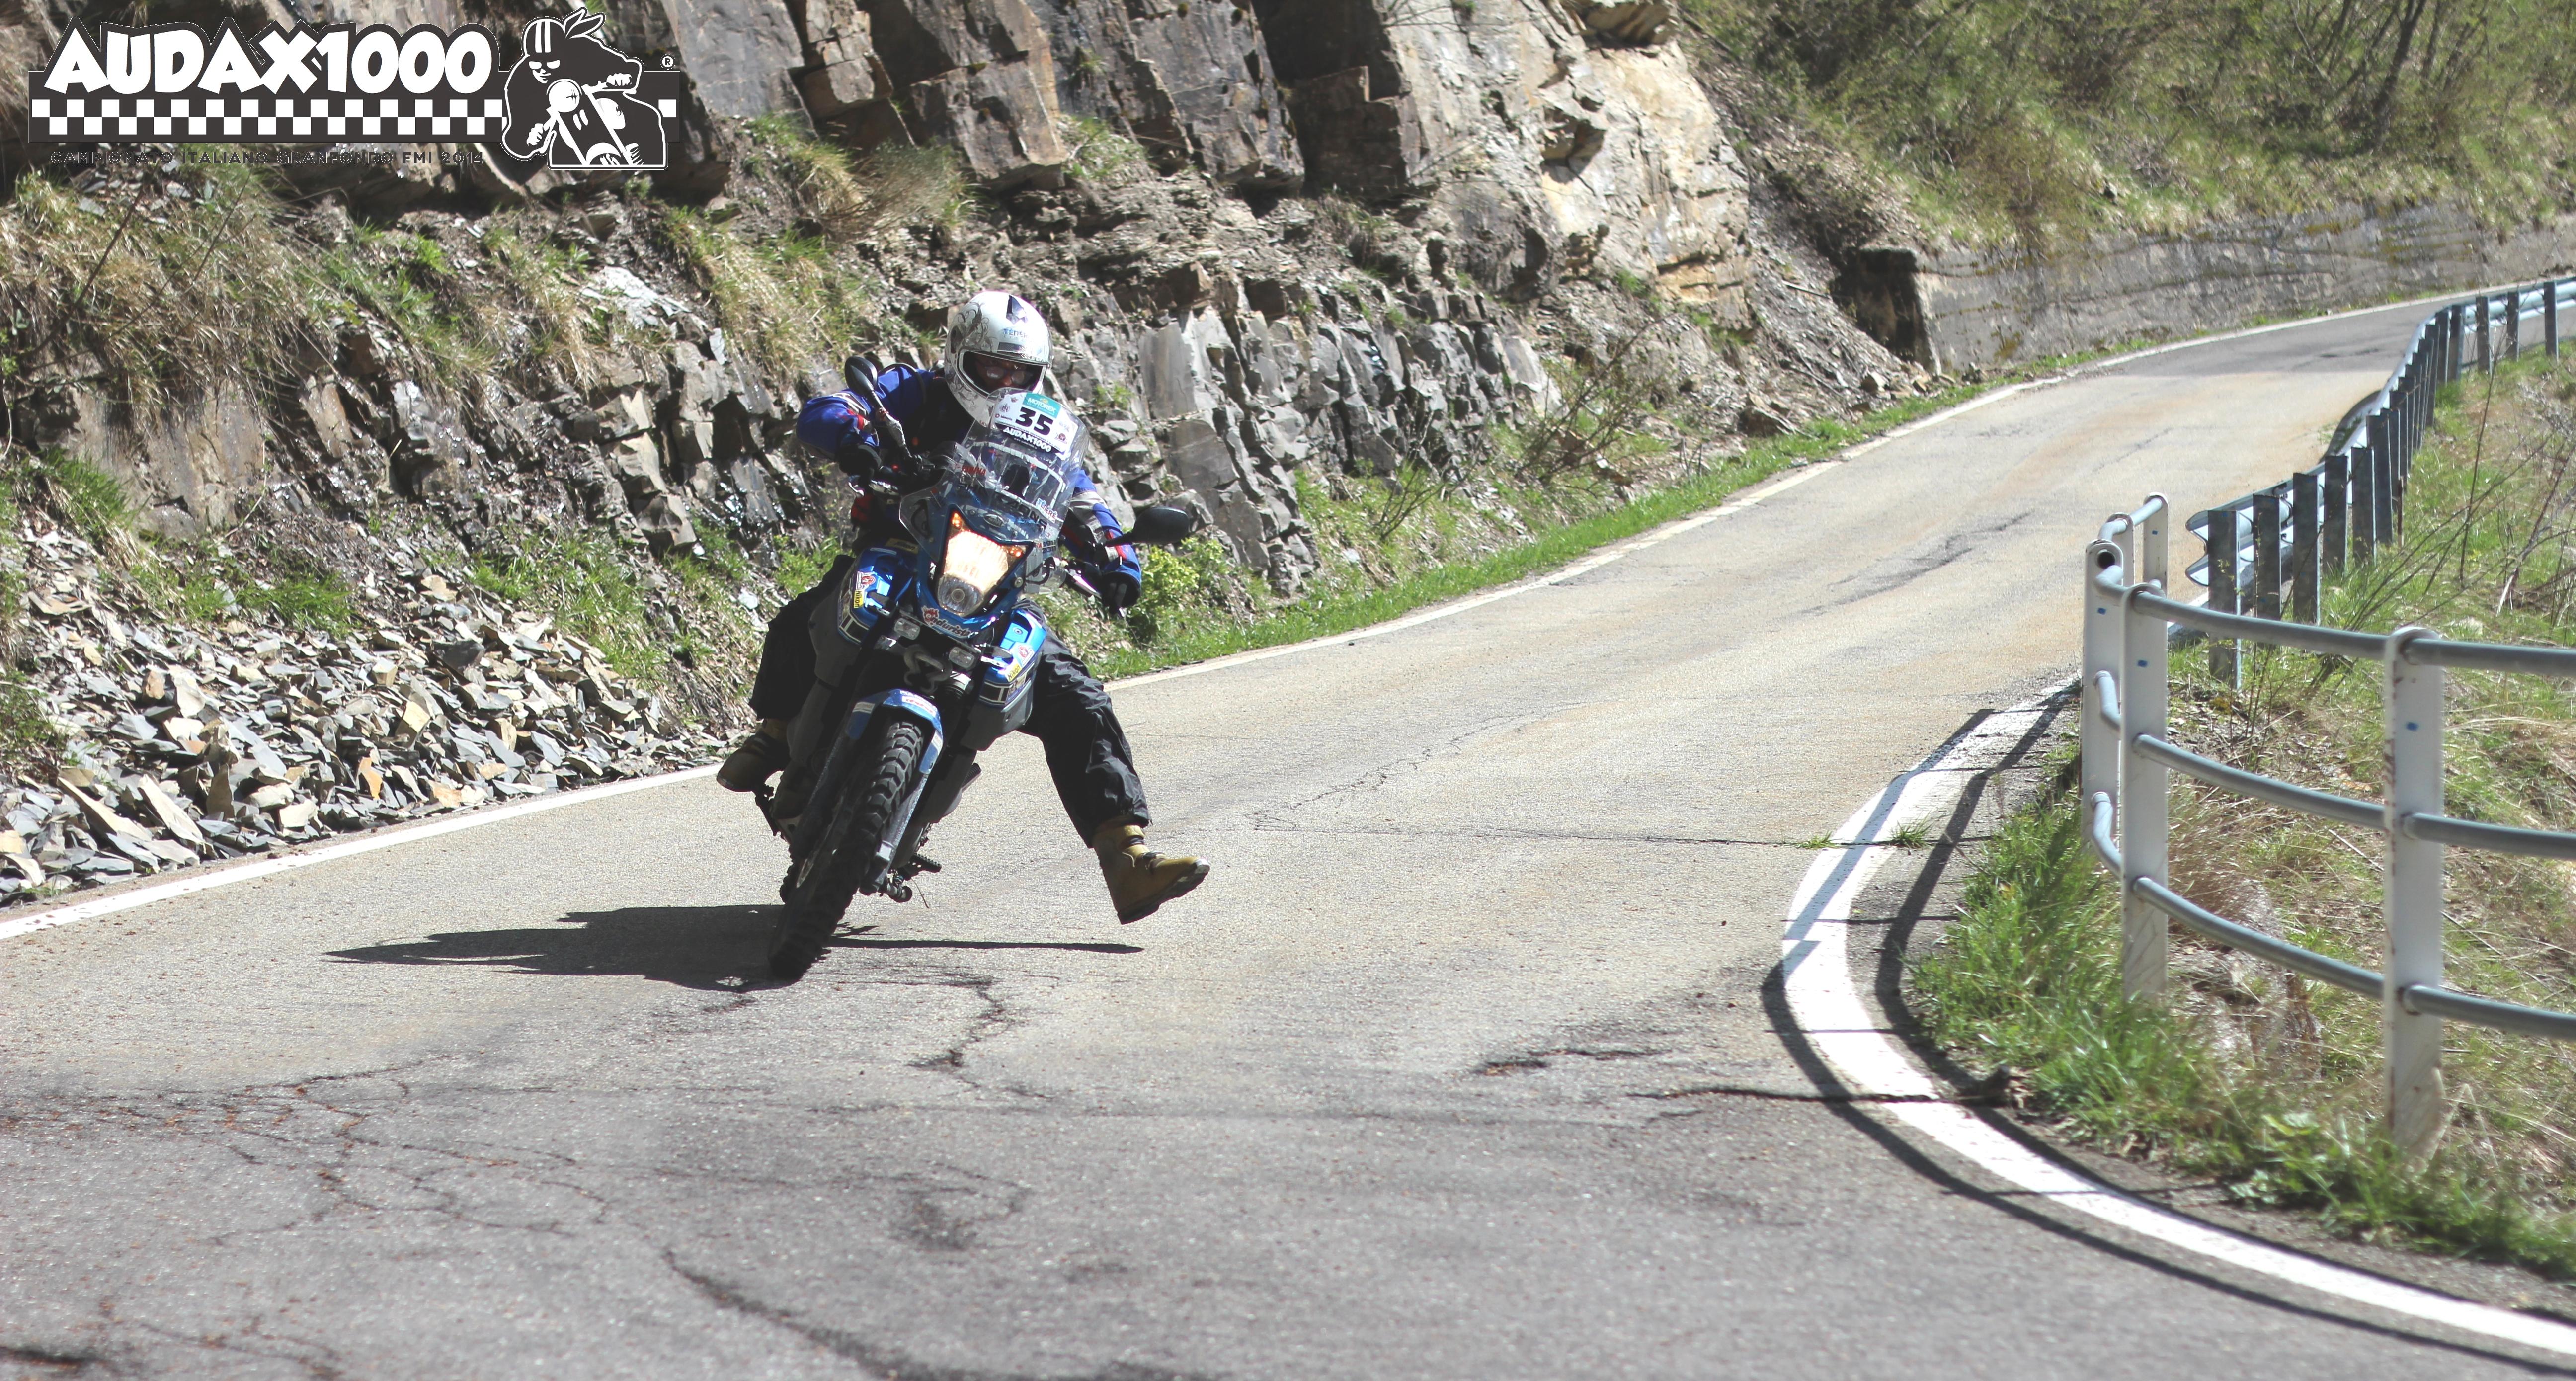 audax1000 GMT on Race